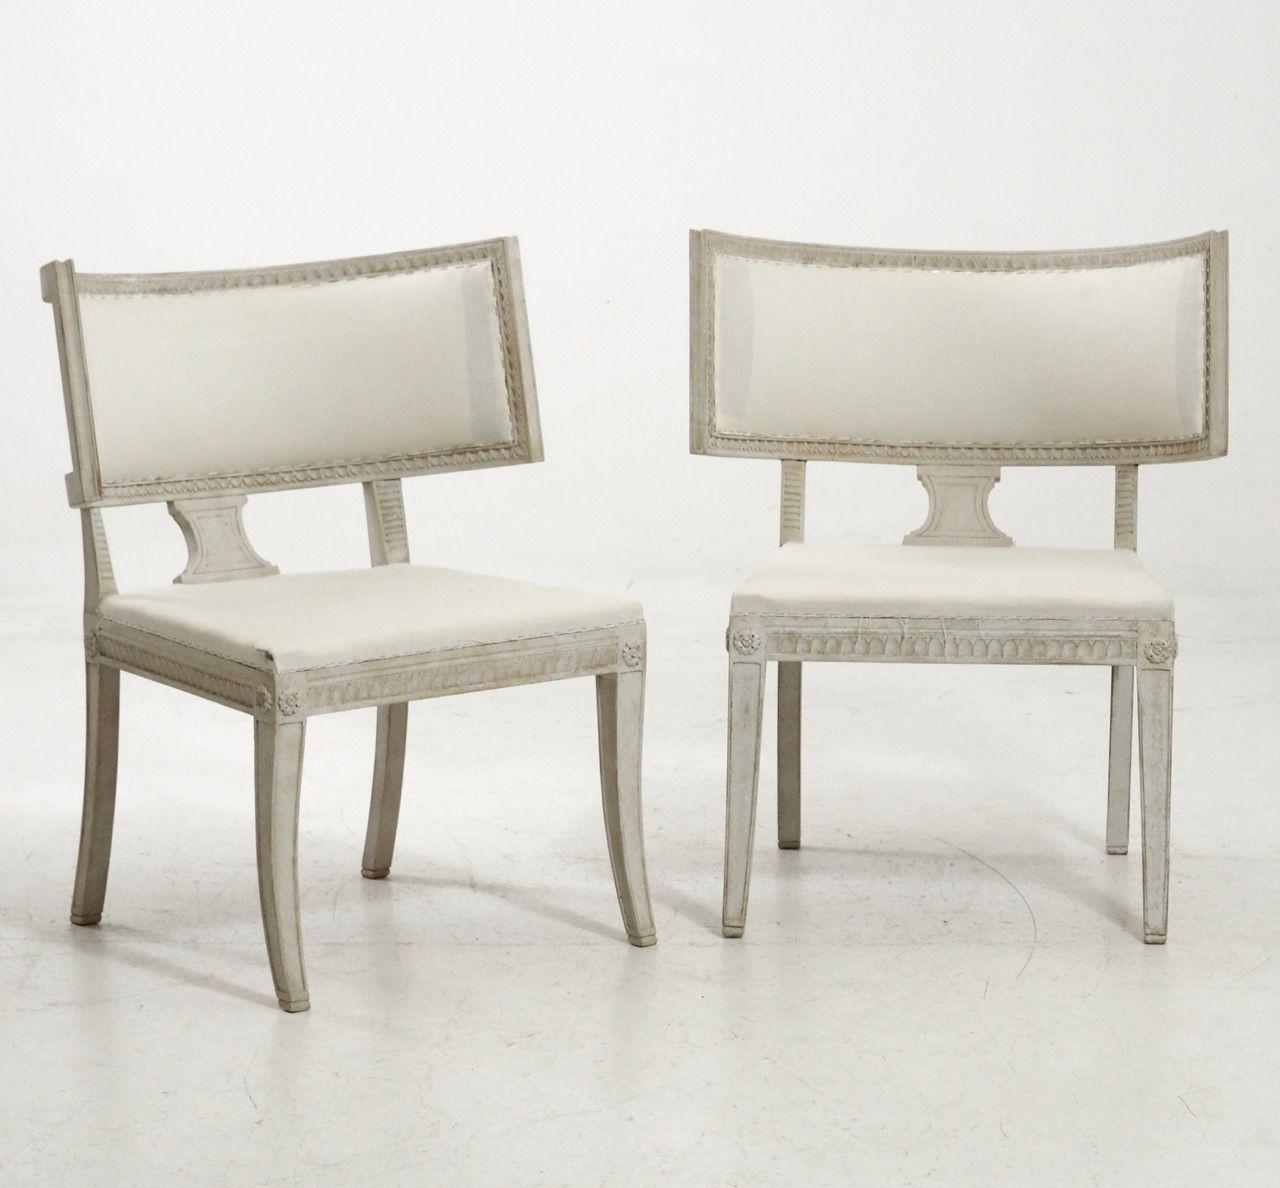 antike st hle mit gebogenen r ckenlehnen 2er set bei. Black Bedroom Furniture Sets. Home Design Ideas